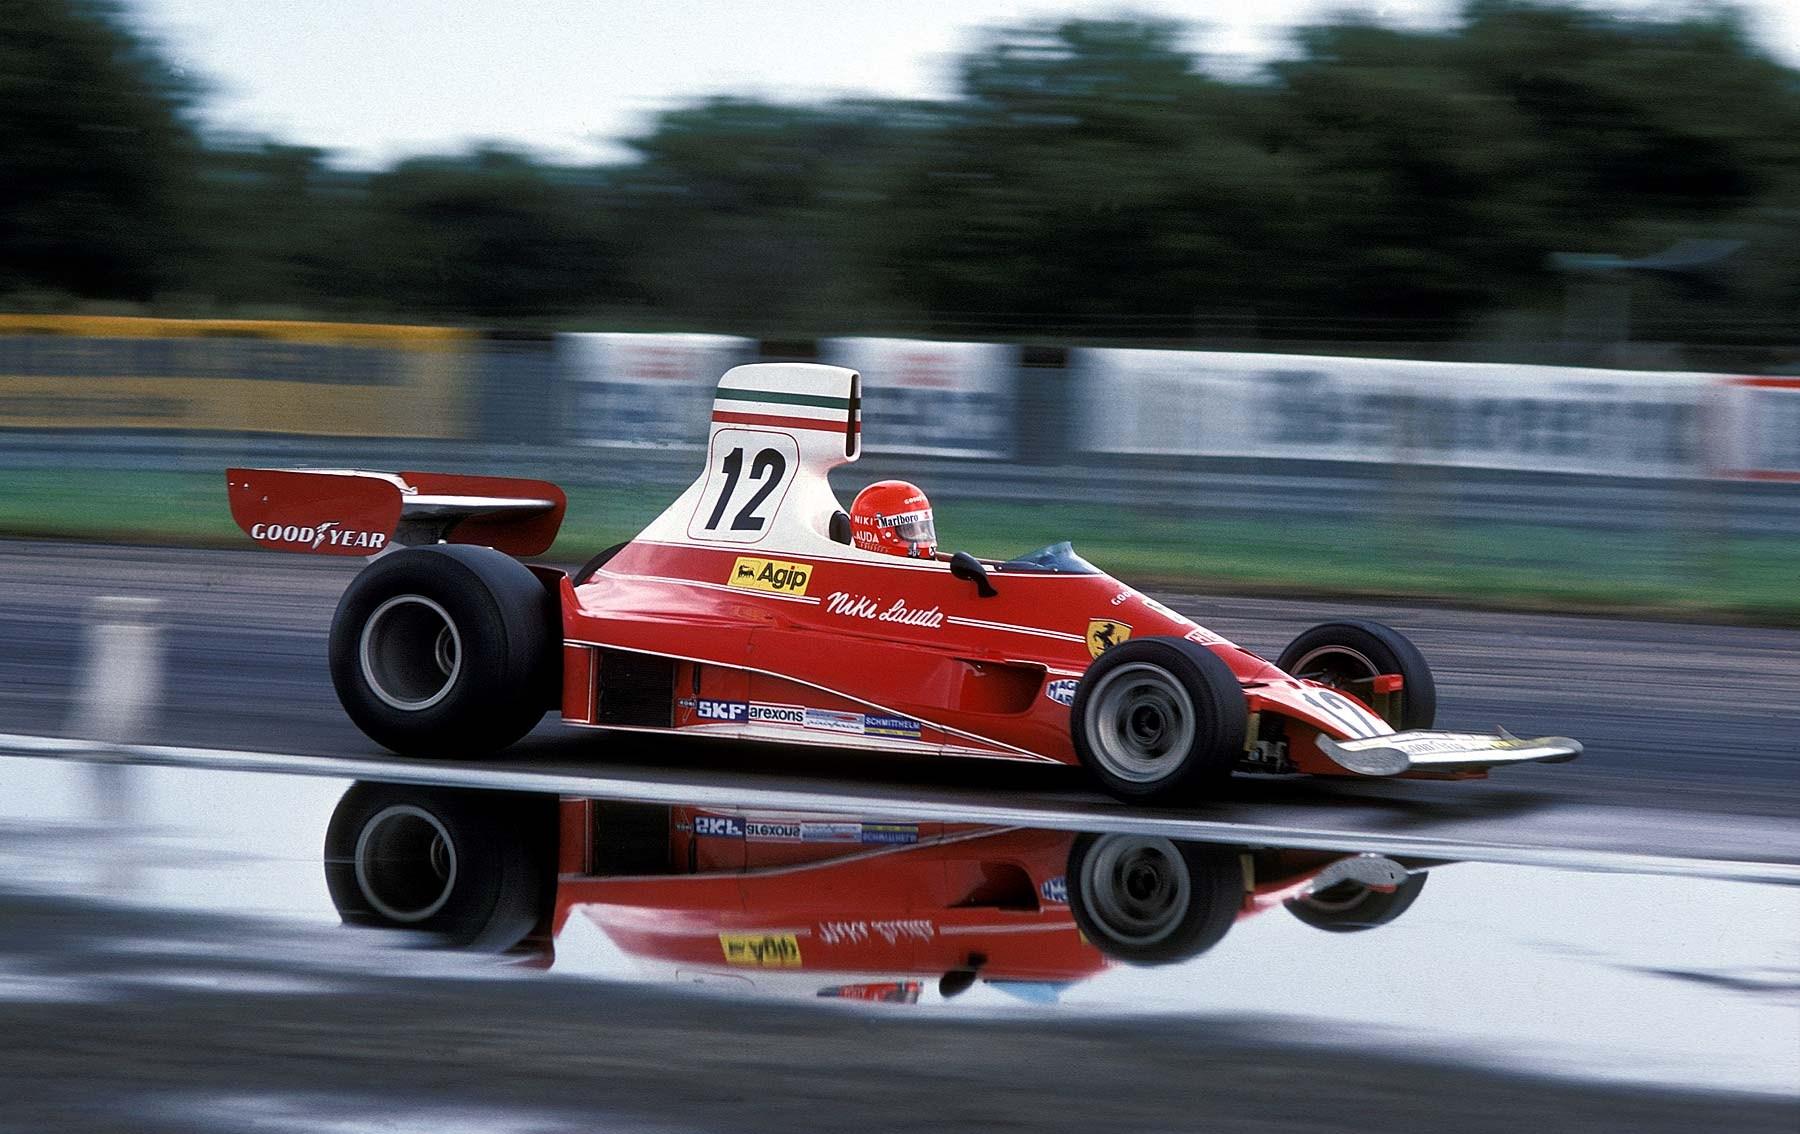 1975_Ferrari_312T_Niki_Lauda_0009